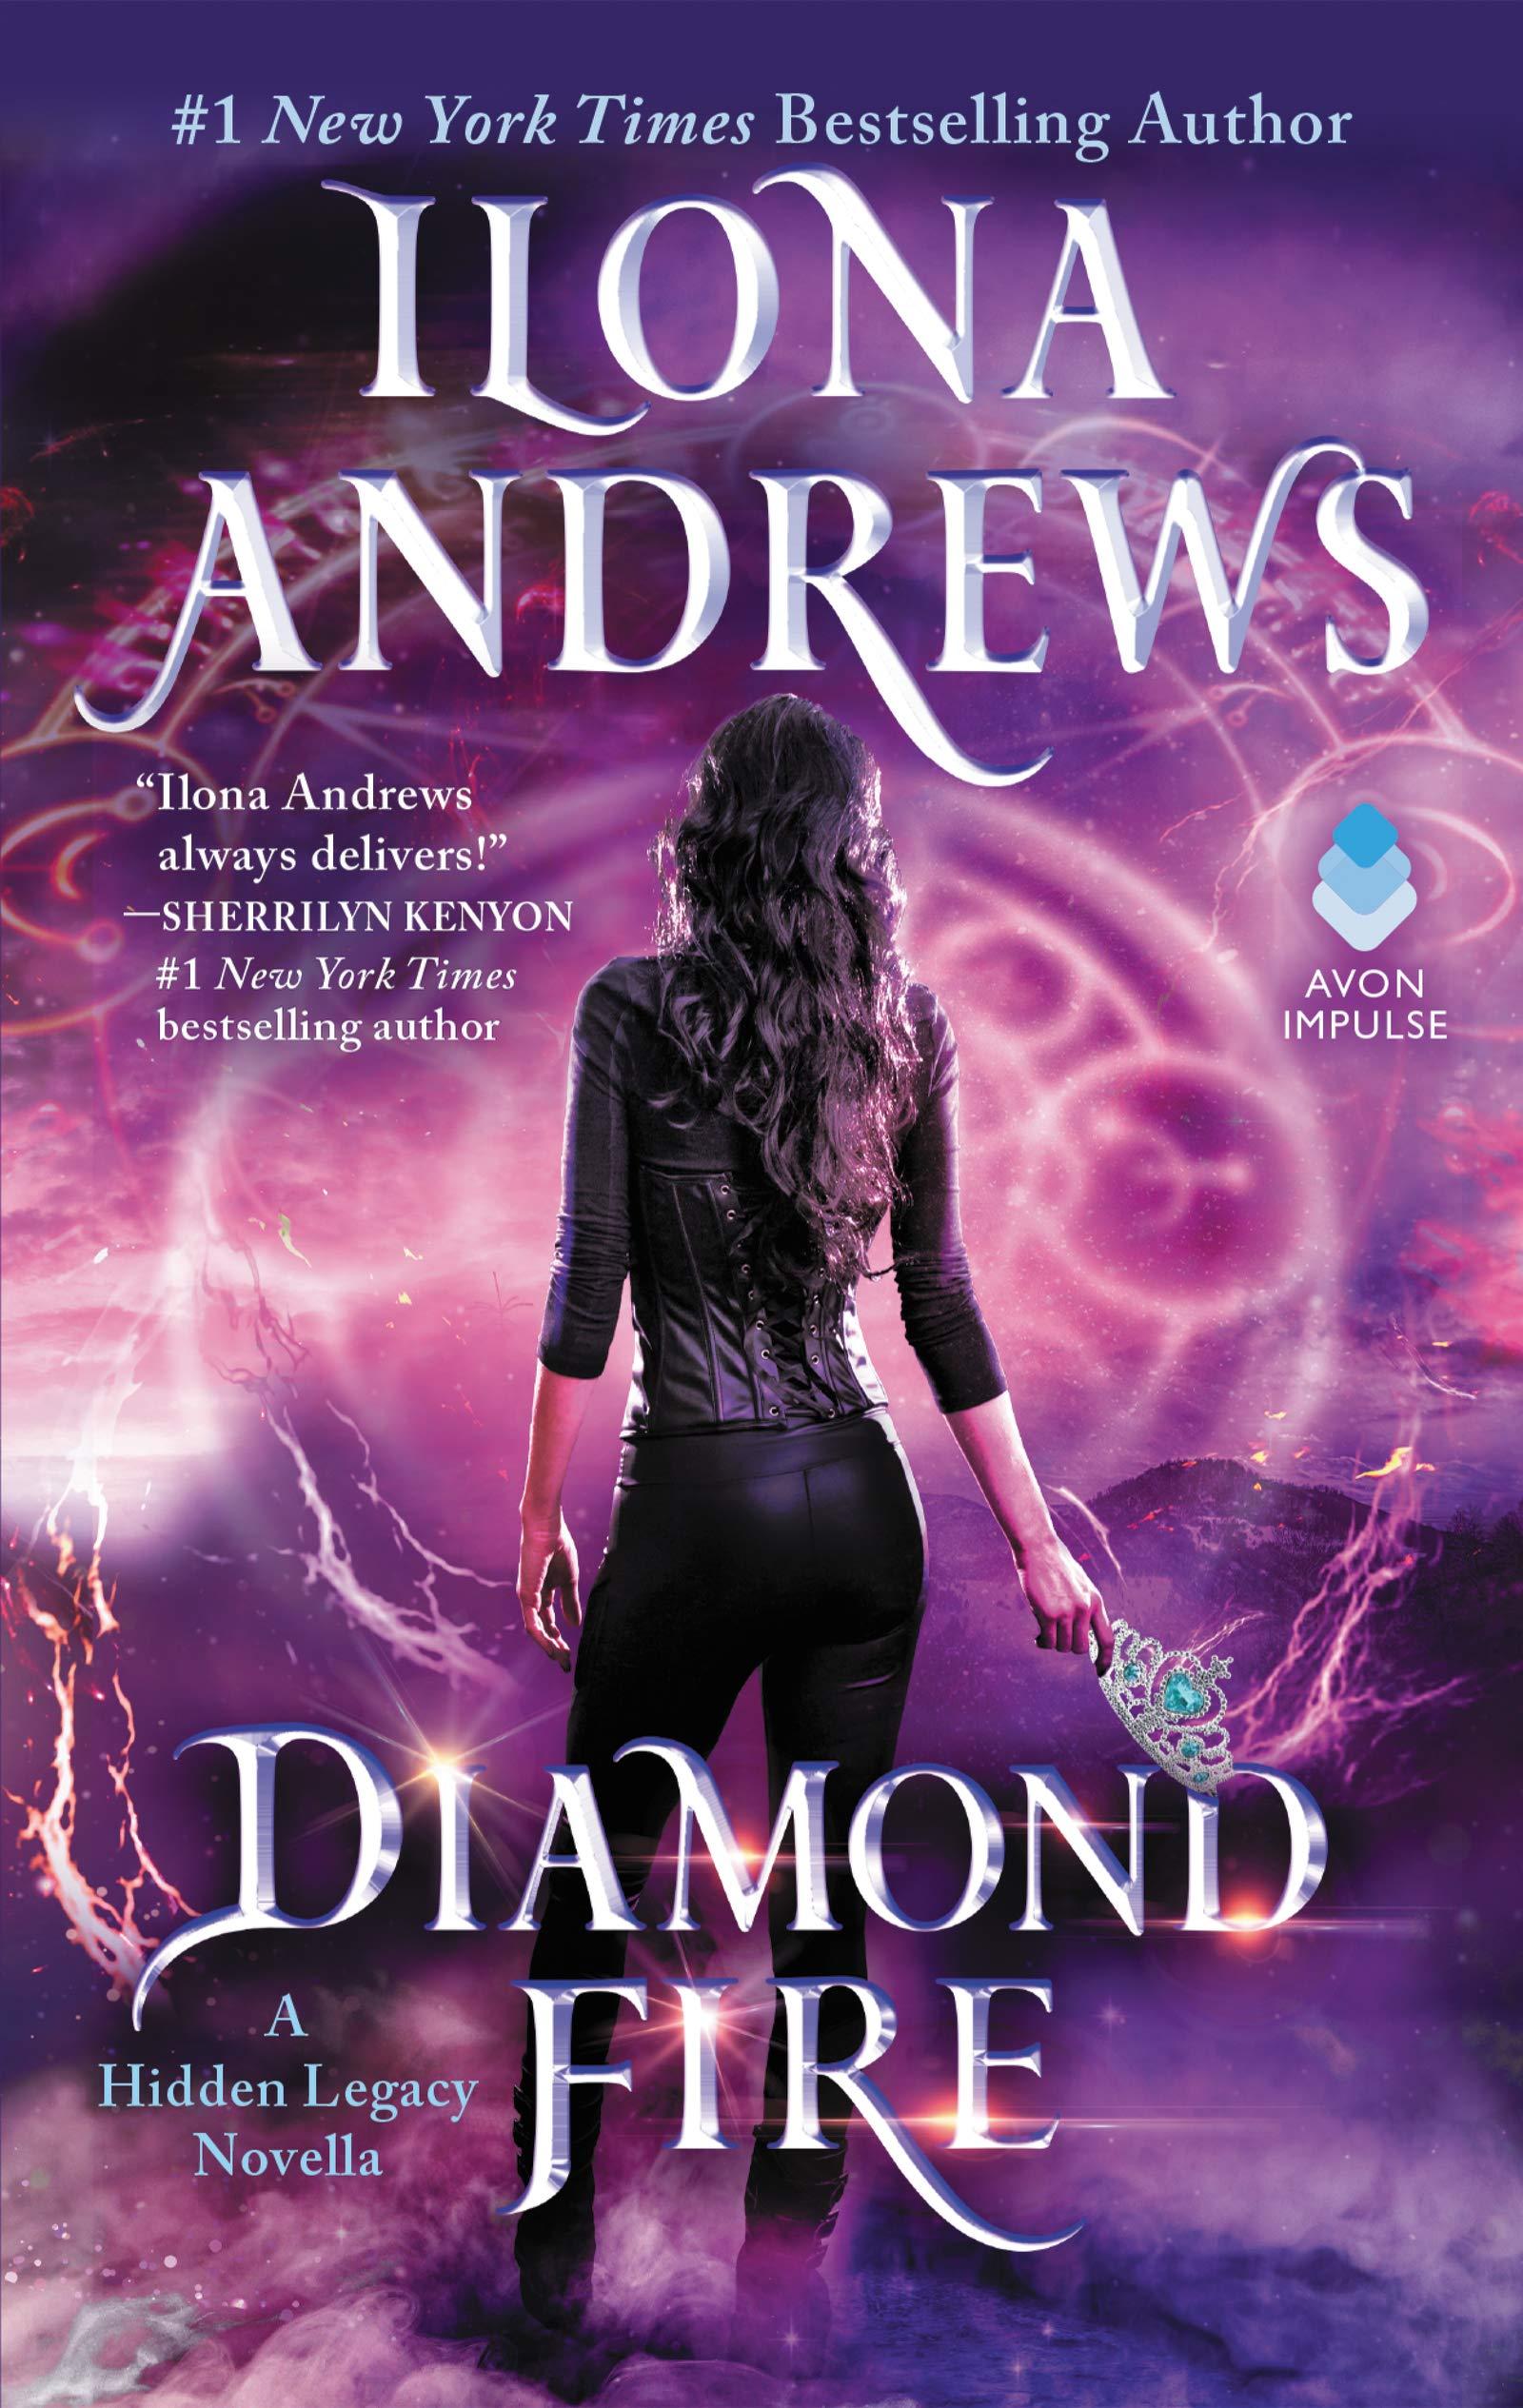 Image result for diamond fire ilona andrews